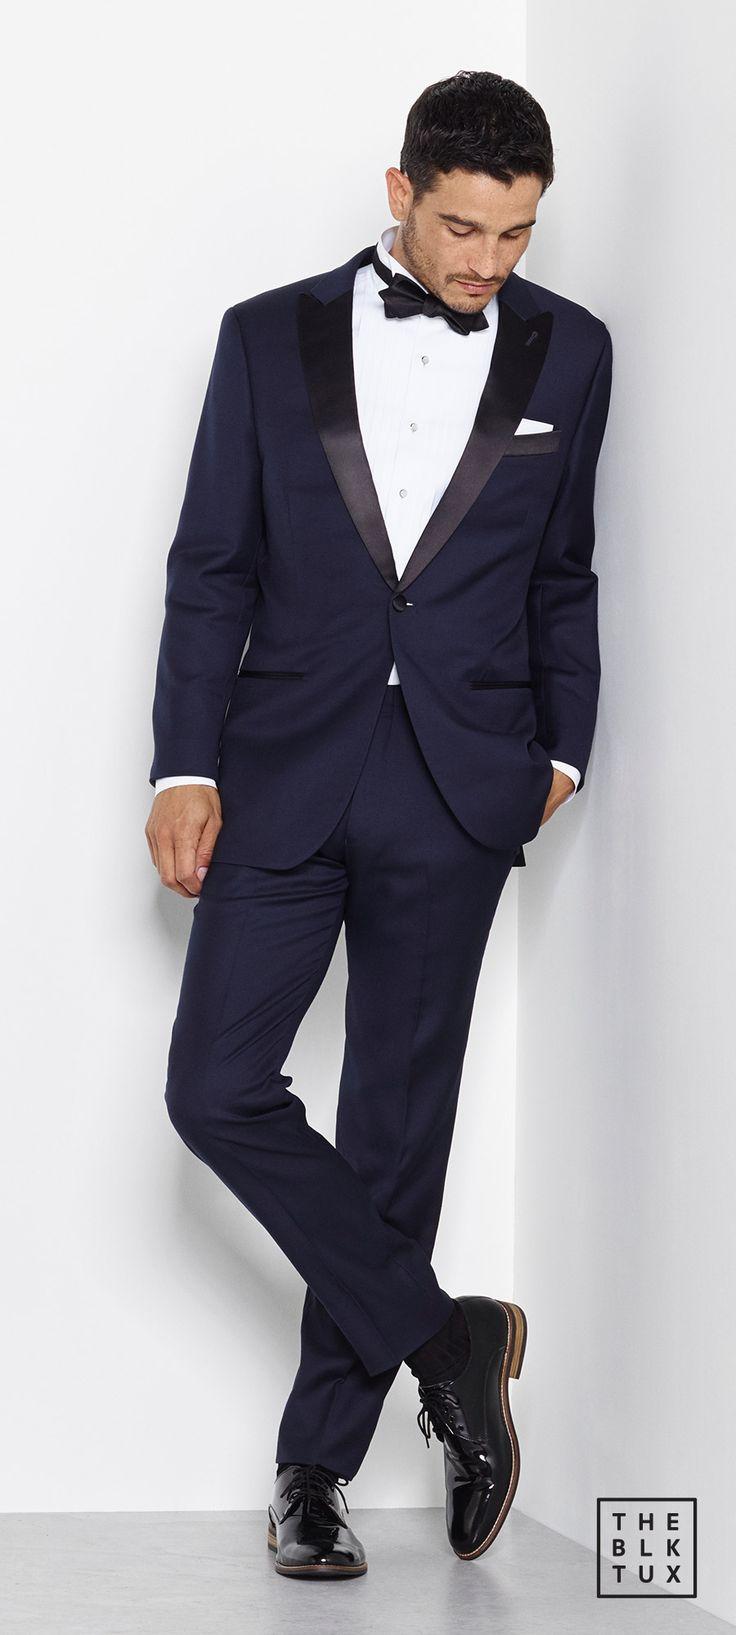 The Black tux 2017 online tuxedo rental service the midnight blue tuxedo groommen best man style -- Suit Up in Style, The Black Tux Way #theblacktux #tuxedo #tuxedorental #groom